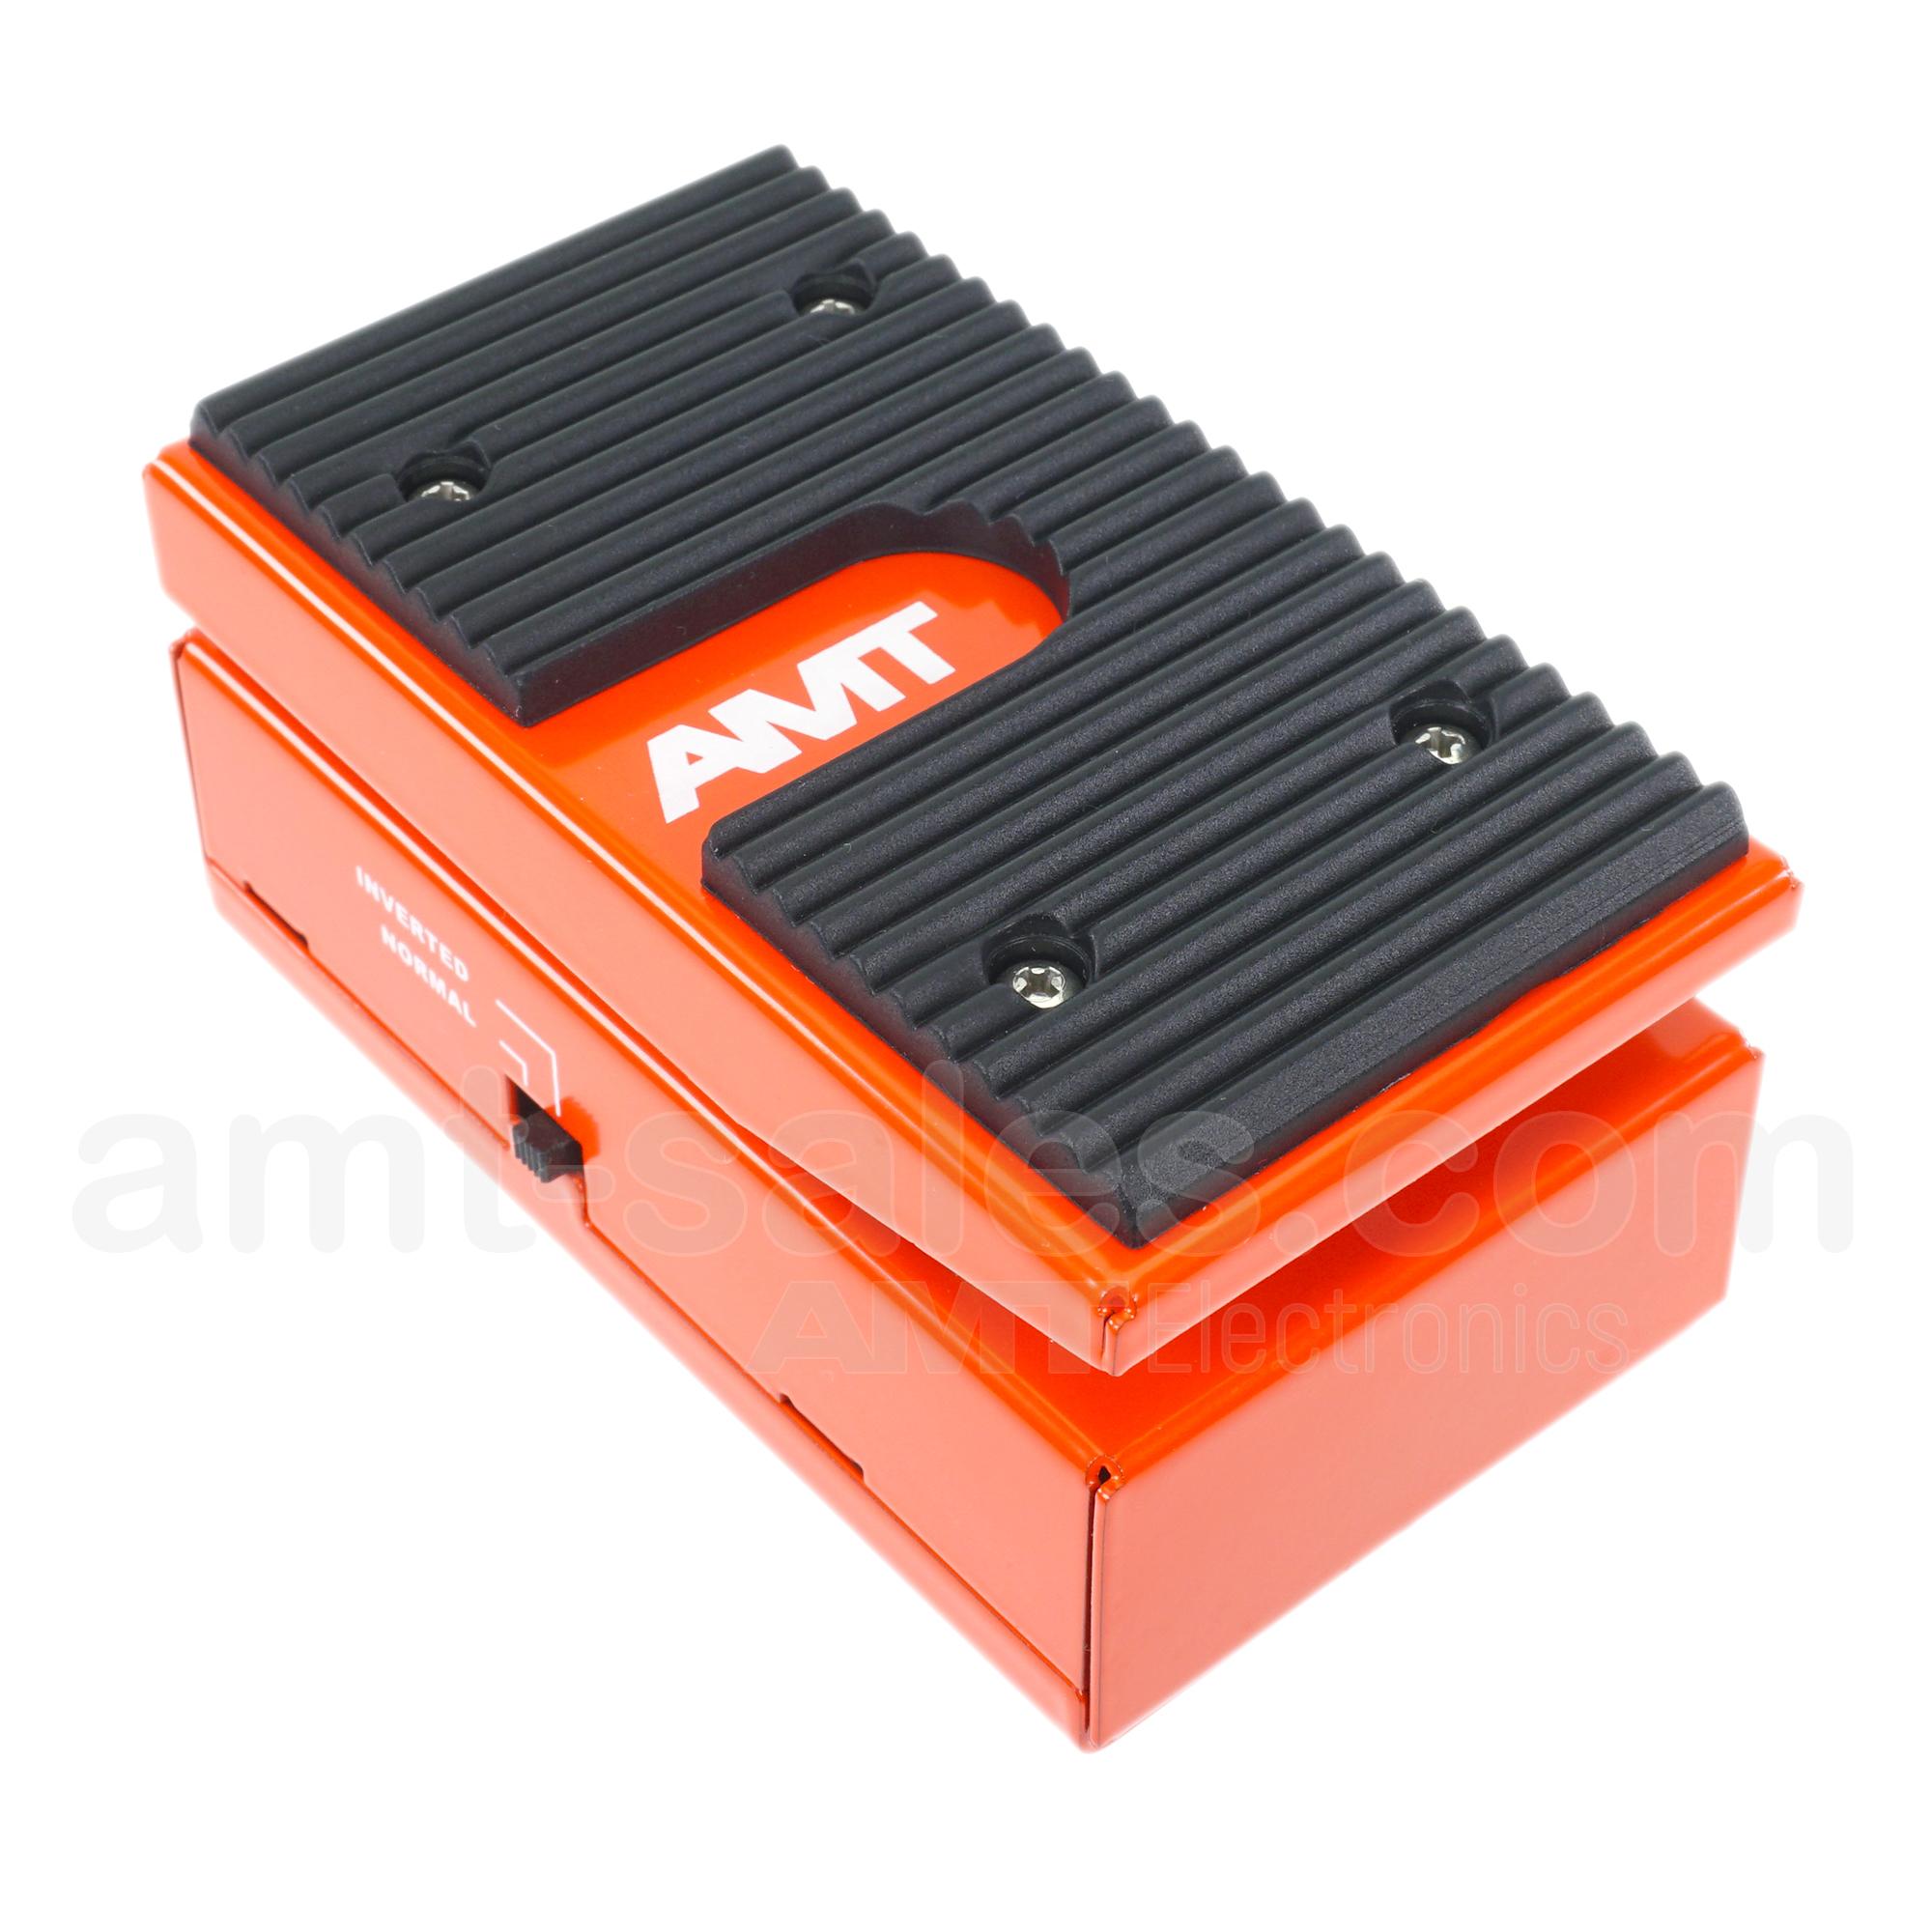 AMT EX-50 - Mini Expression Pedal